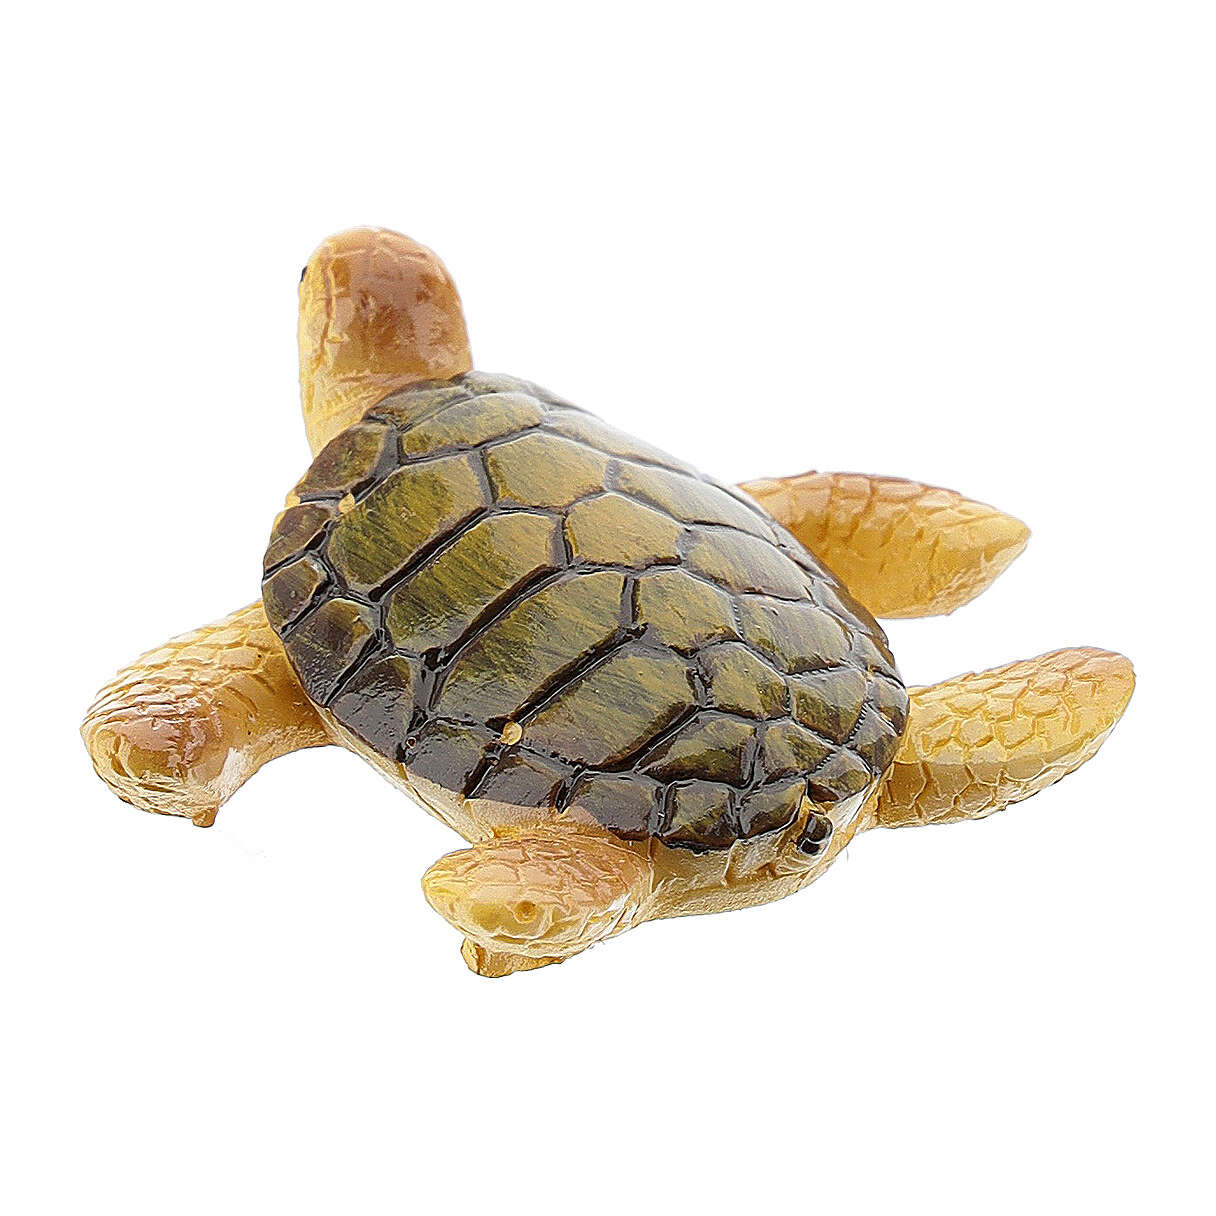 Tartaruga marina presepe resina 8-10 cm 3